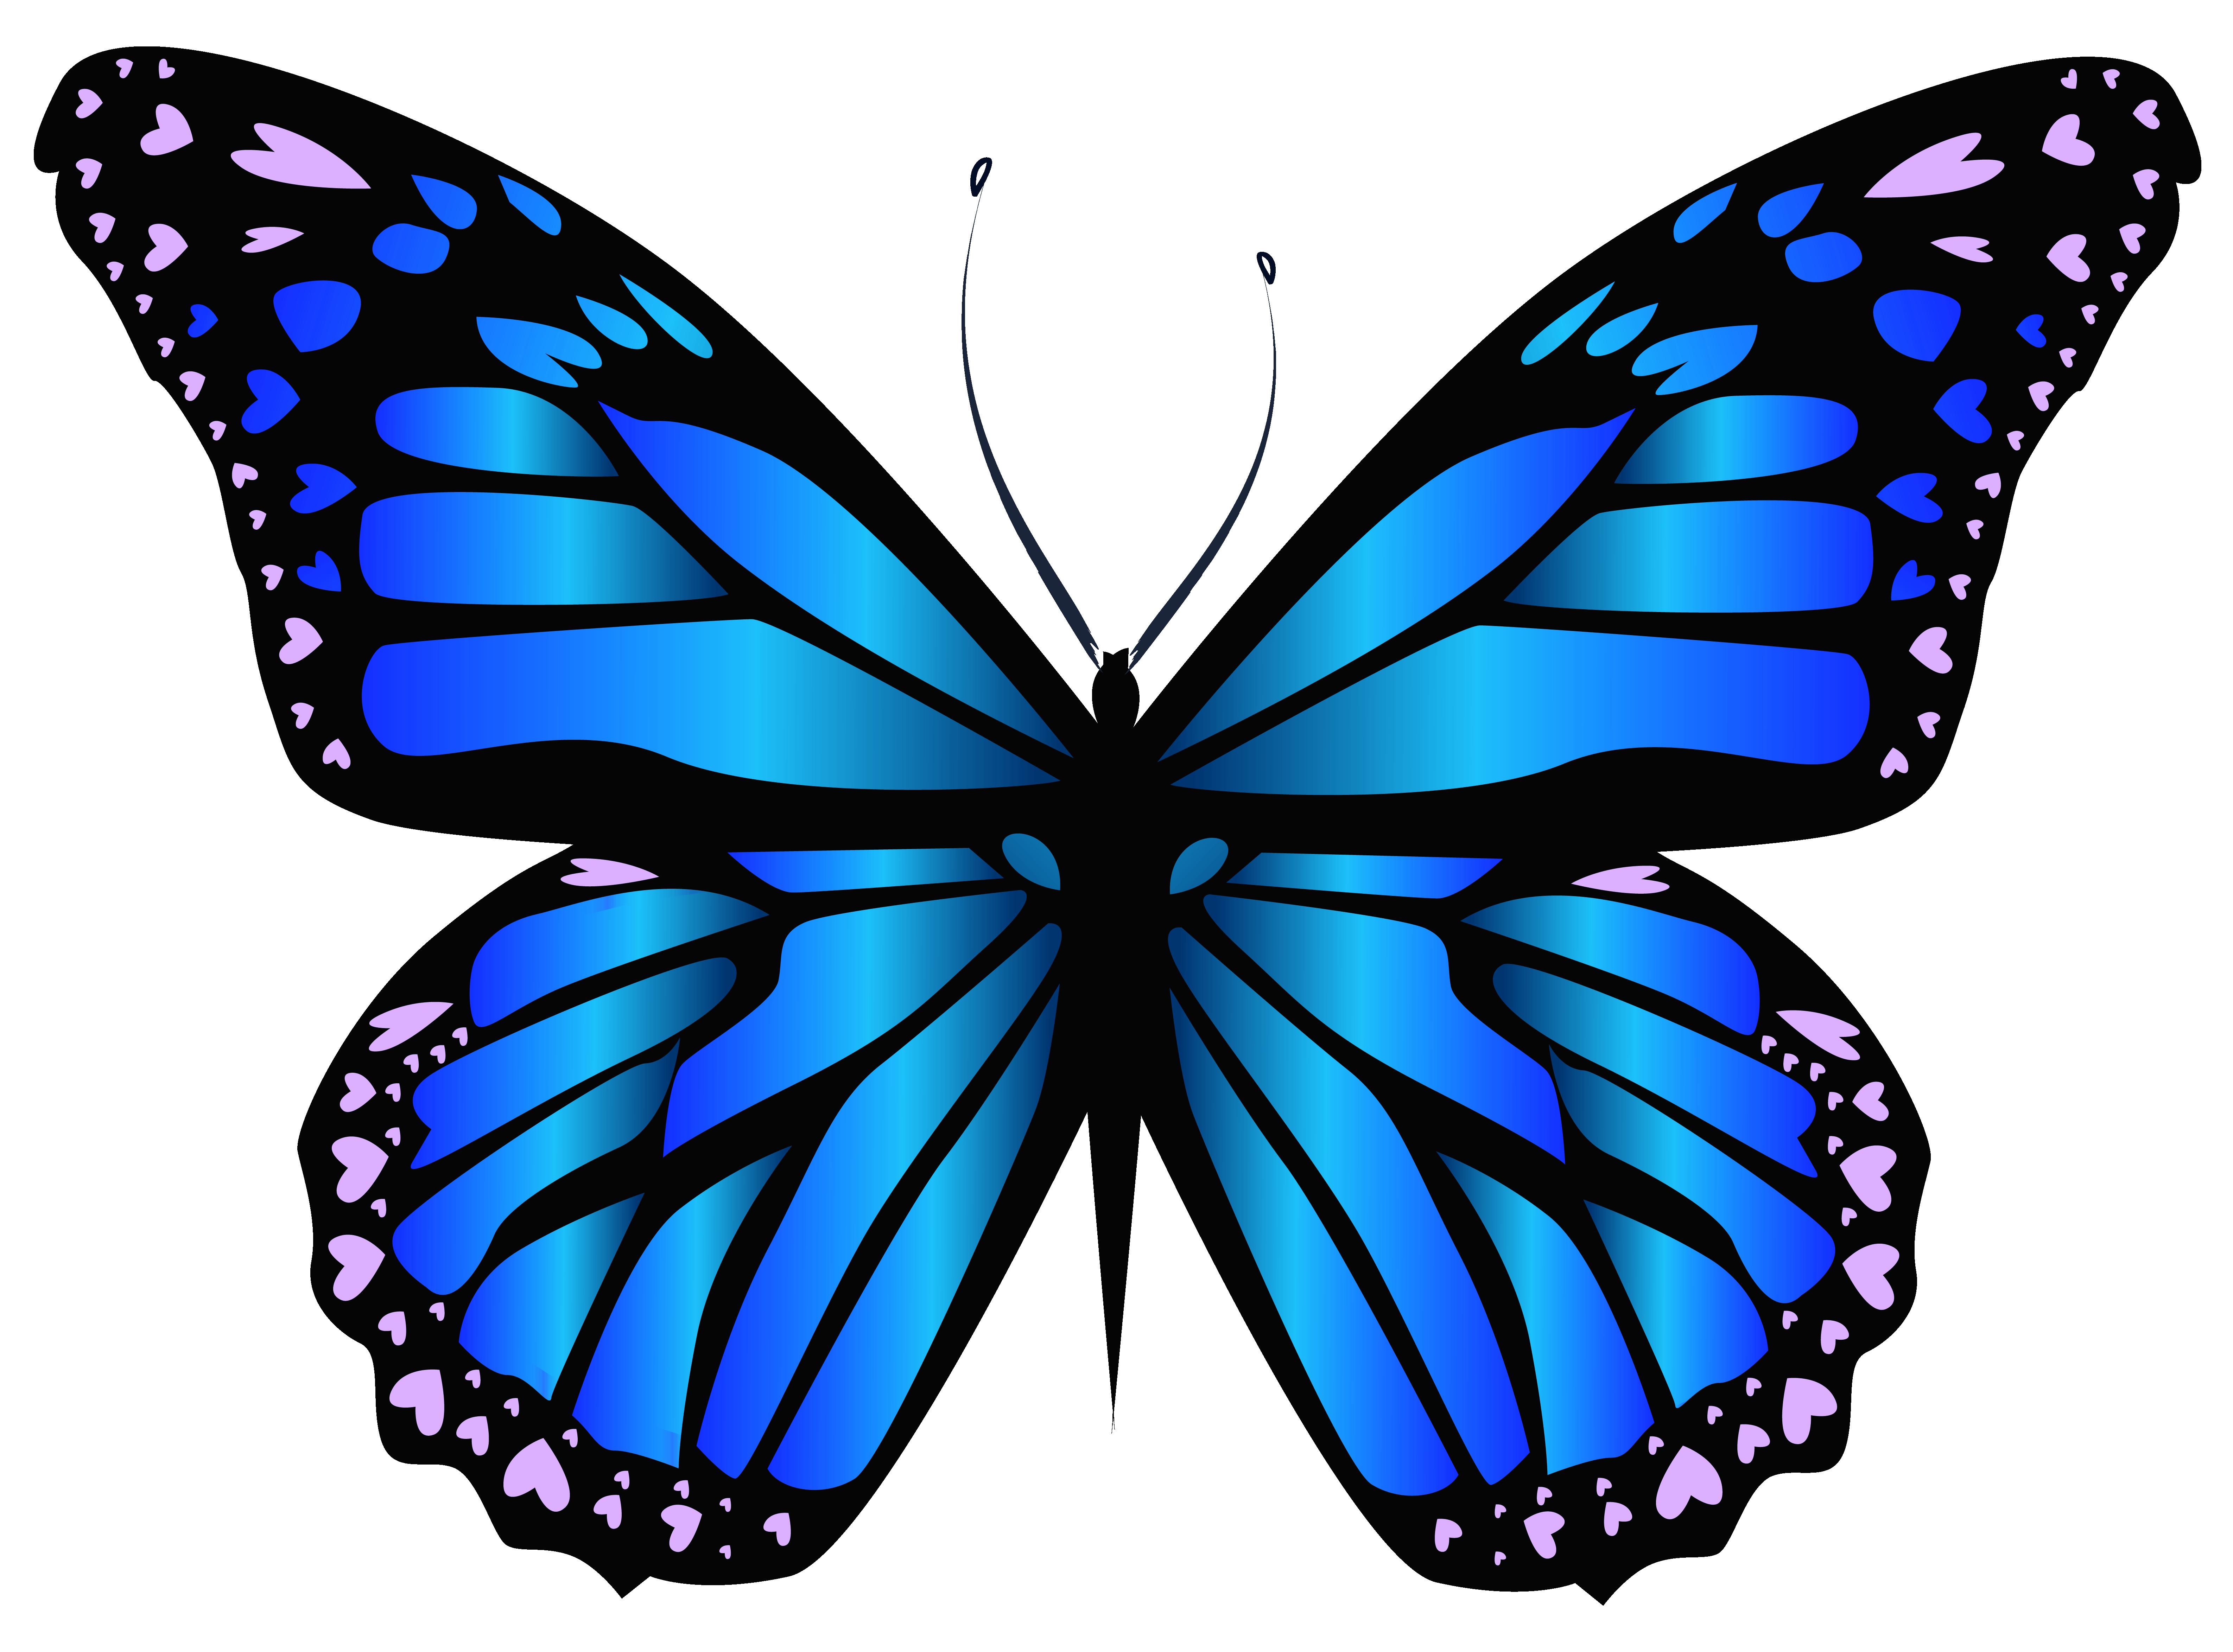 Blue Butterfly PNG Clipar Image.